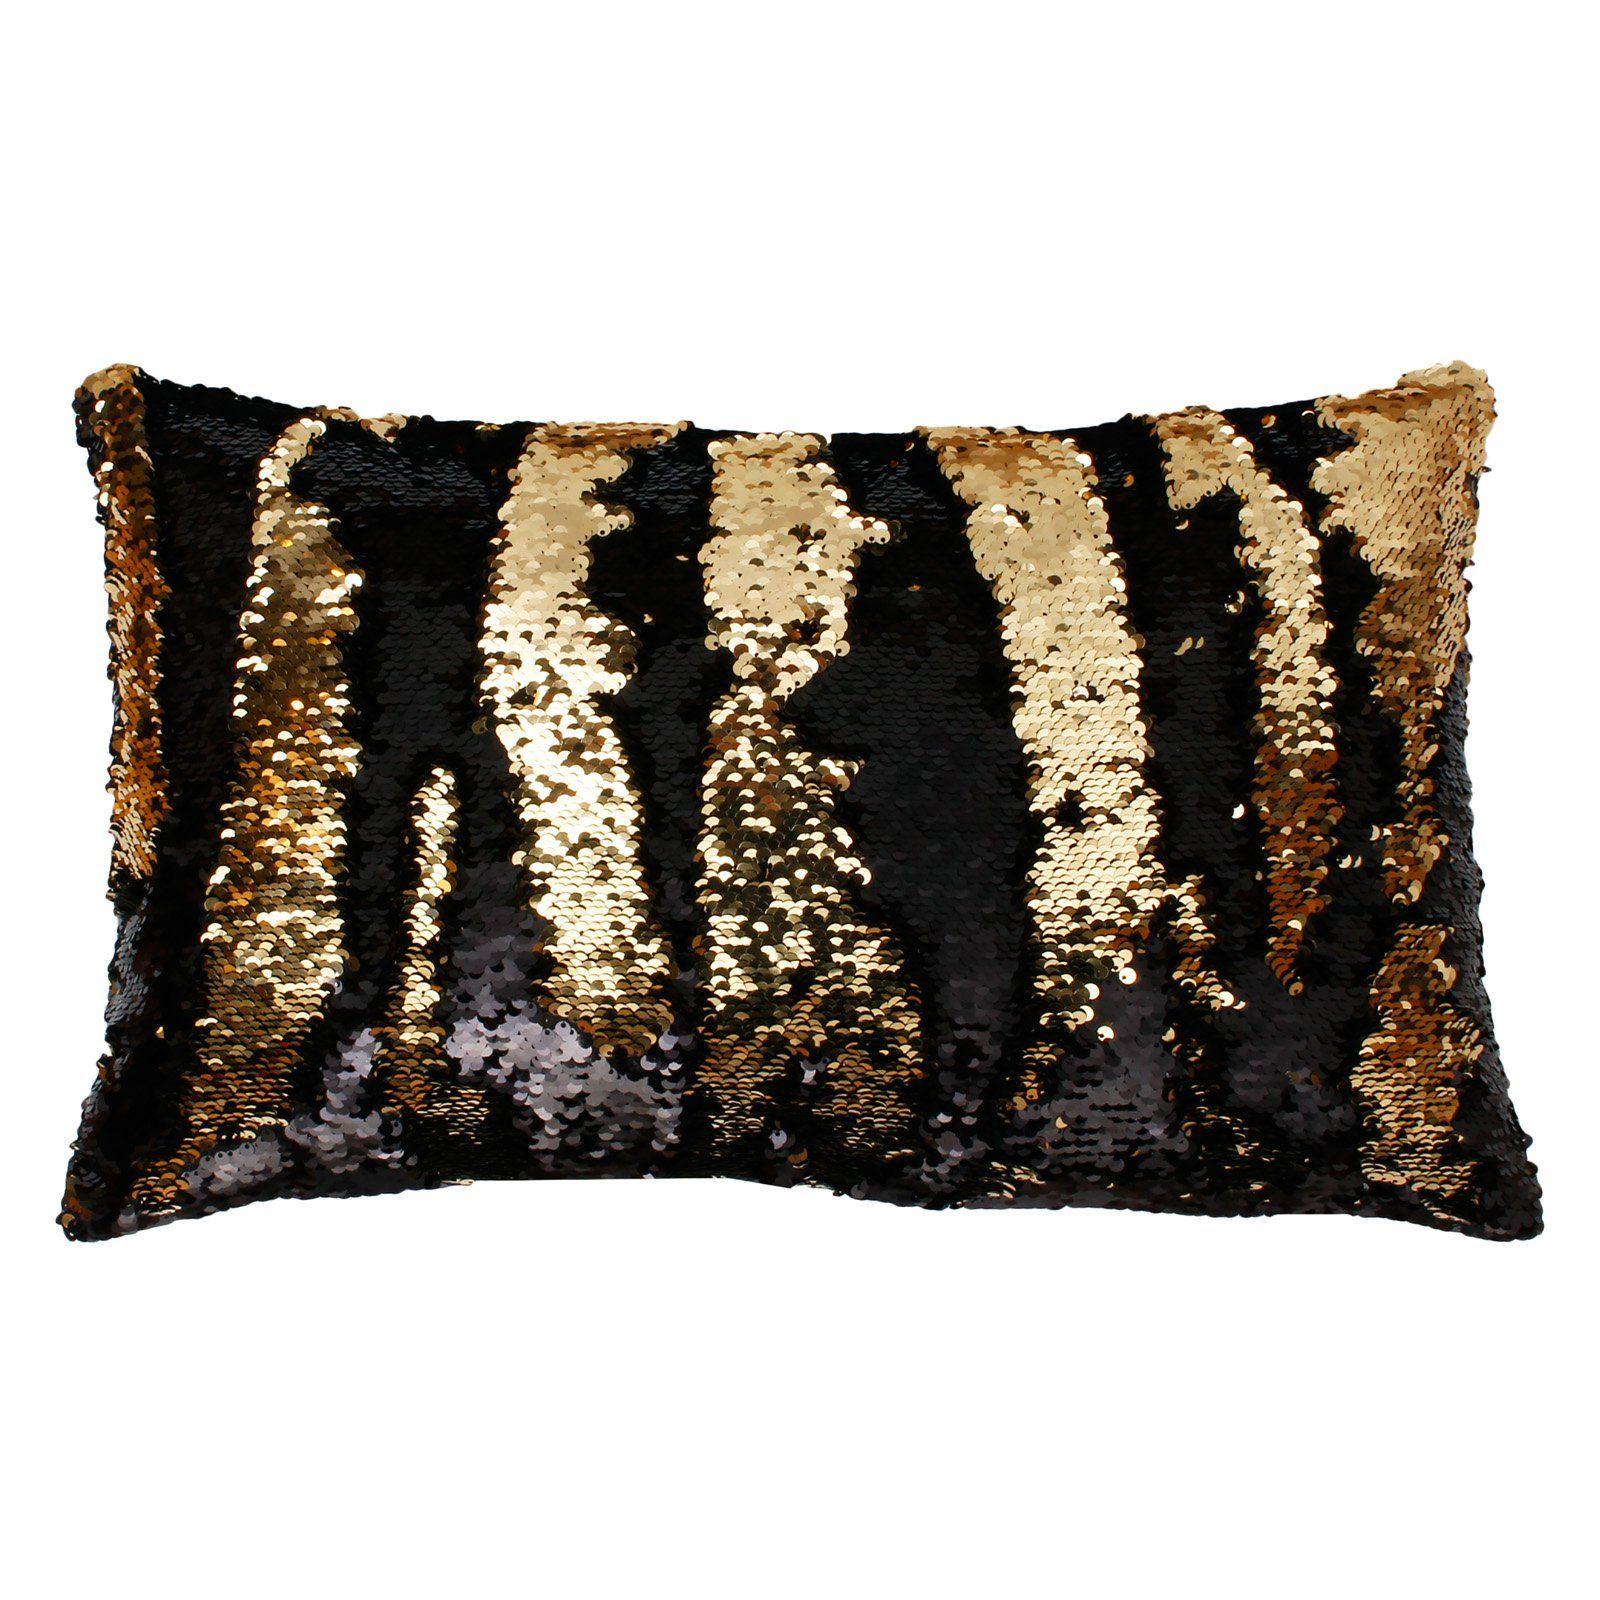 Thro Ltd Melody Mermaid Shiny Metallic Rectangle Decorative Pillow